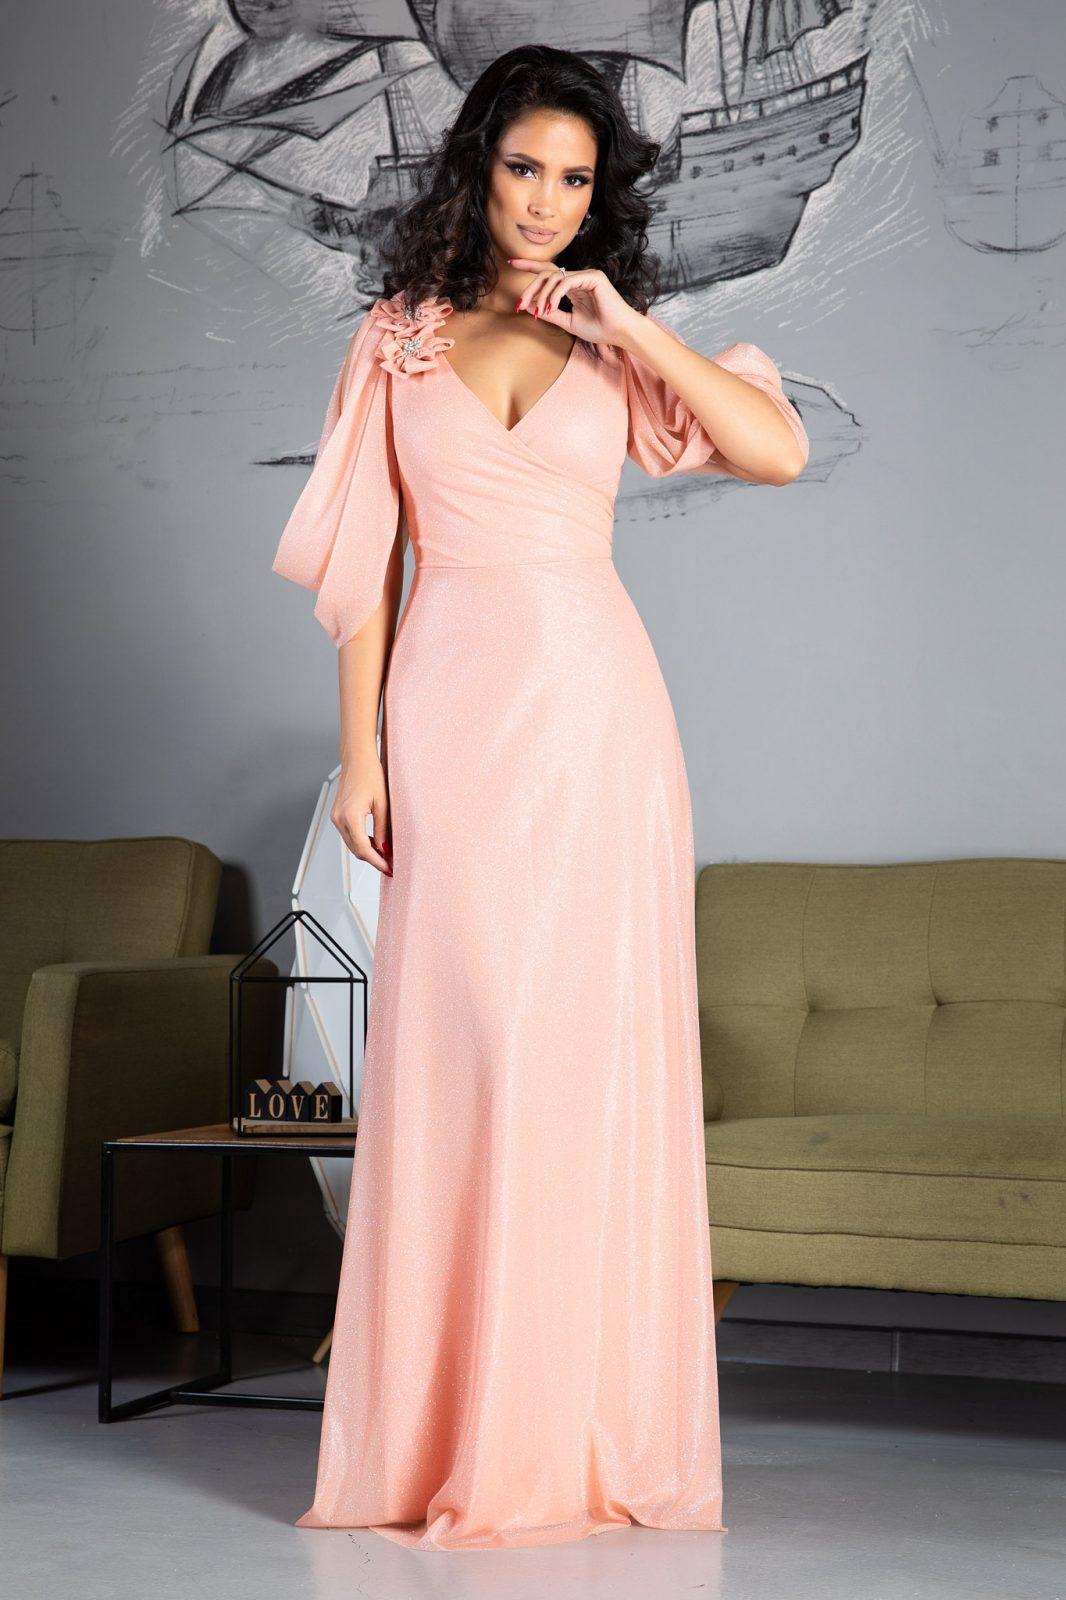 Teresa Pink Dress